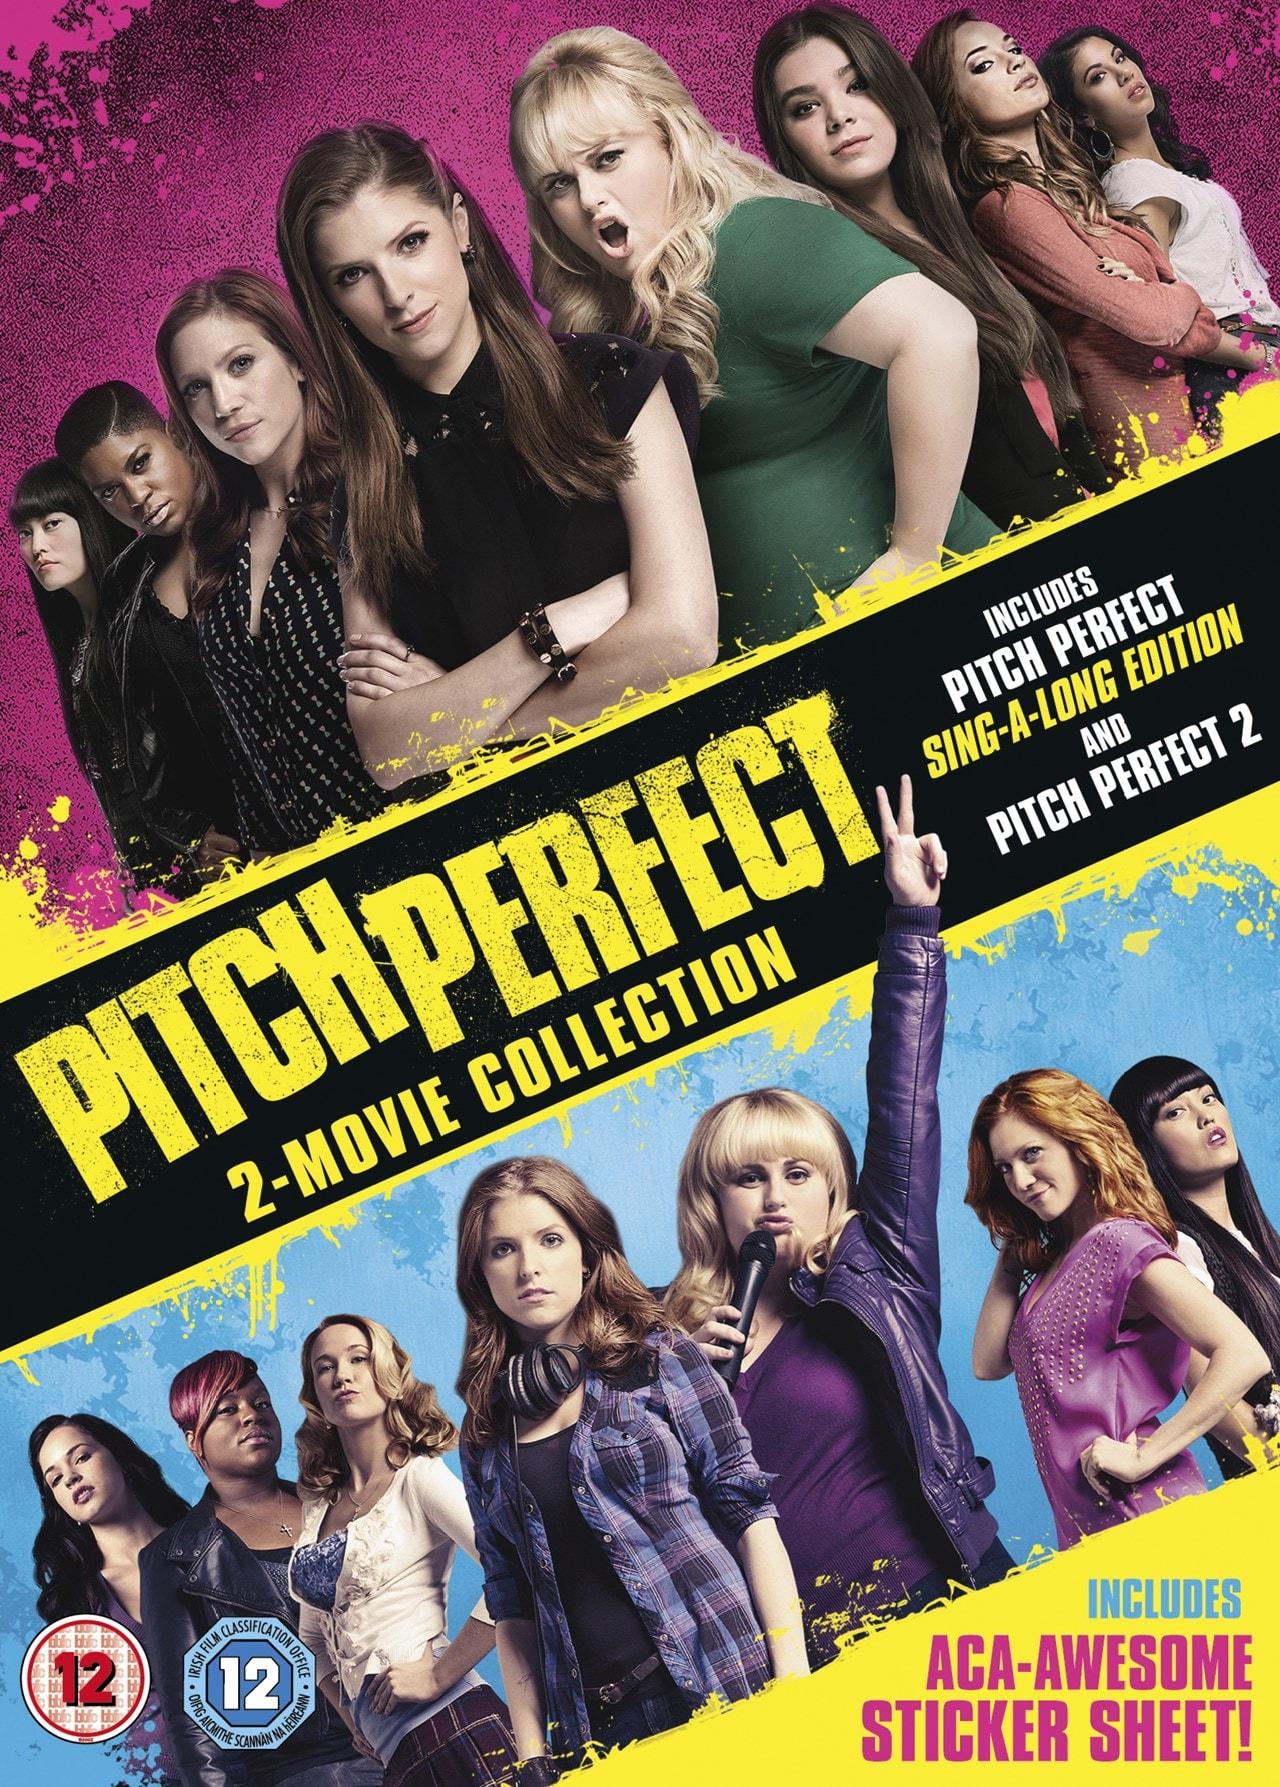 Pitch Perfect/Pitch Perfect 2 - 1